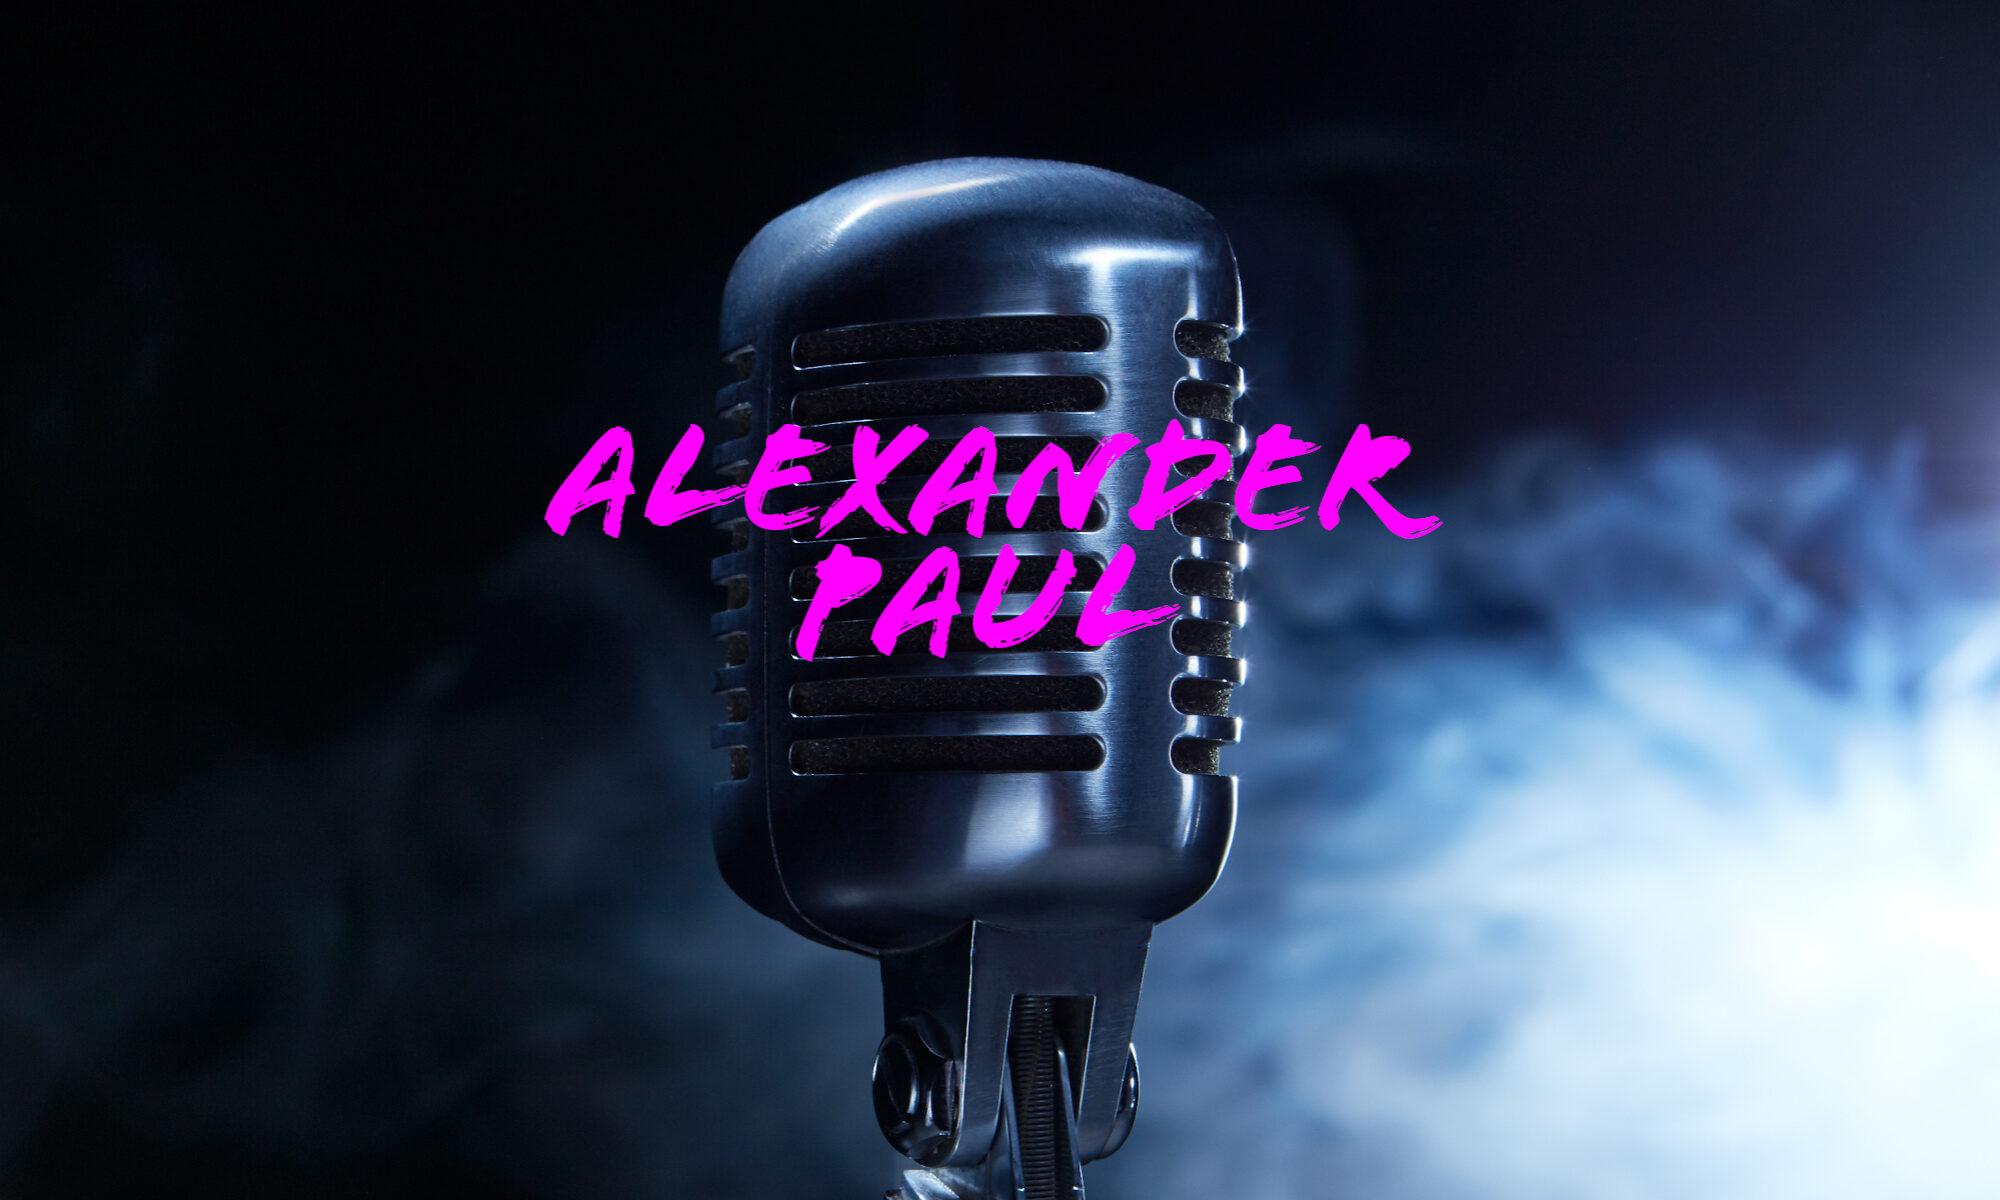 Alexander Paul